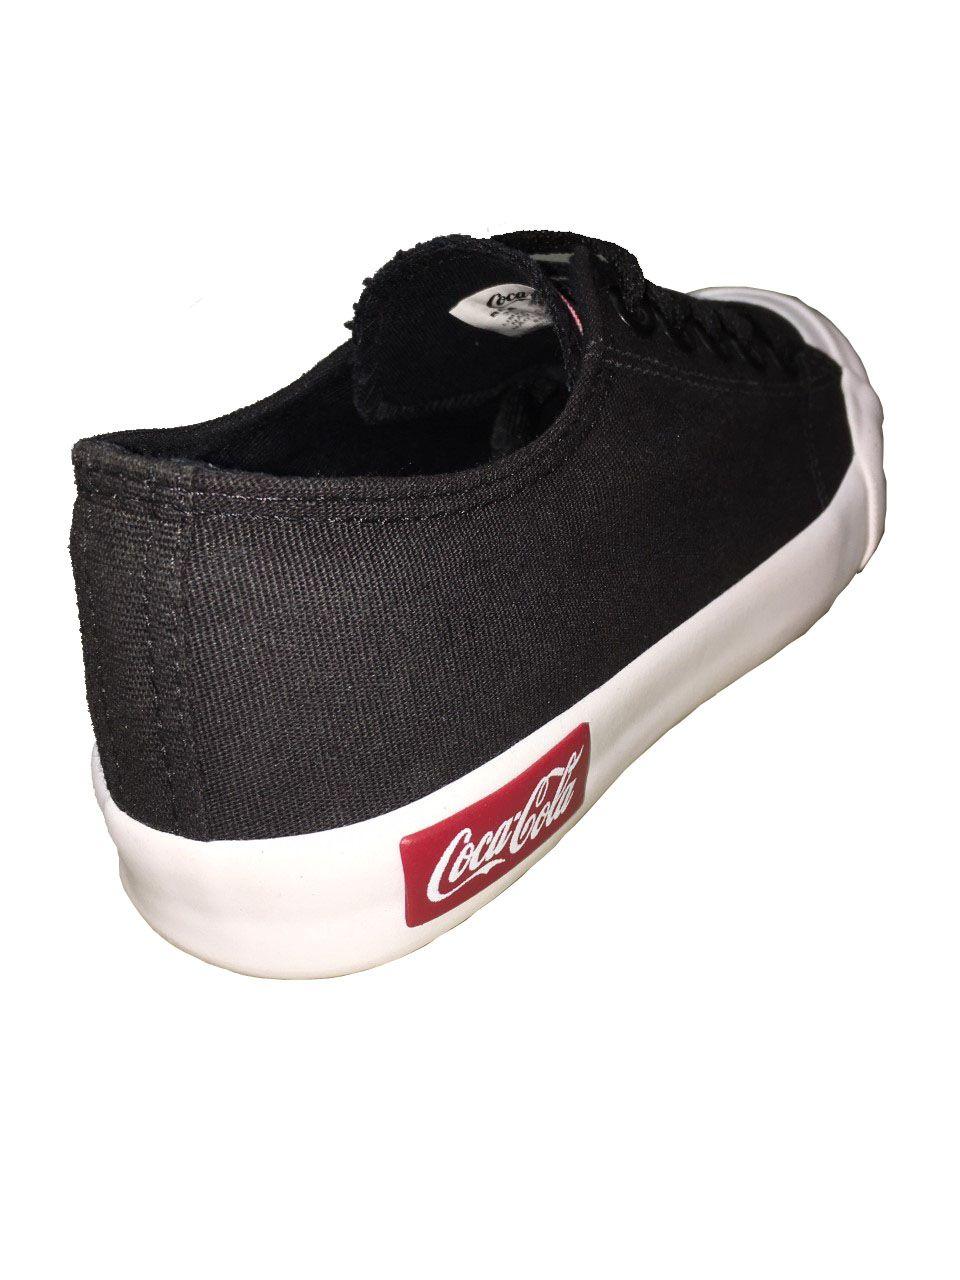 Tênis Coca Cola Basket Resort Preto